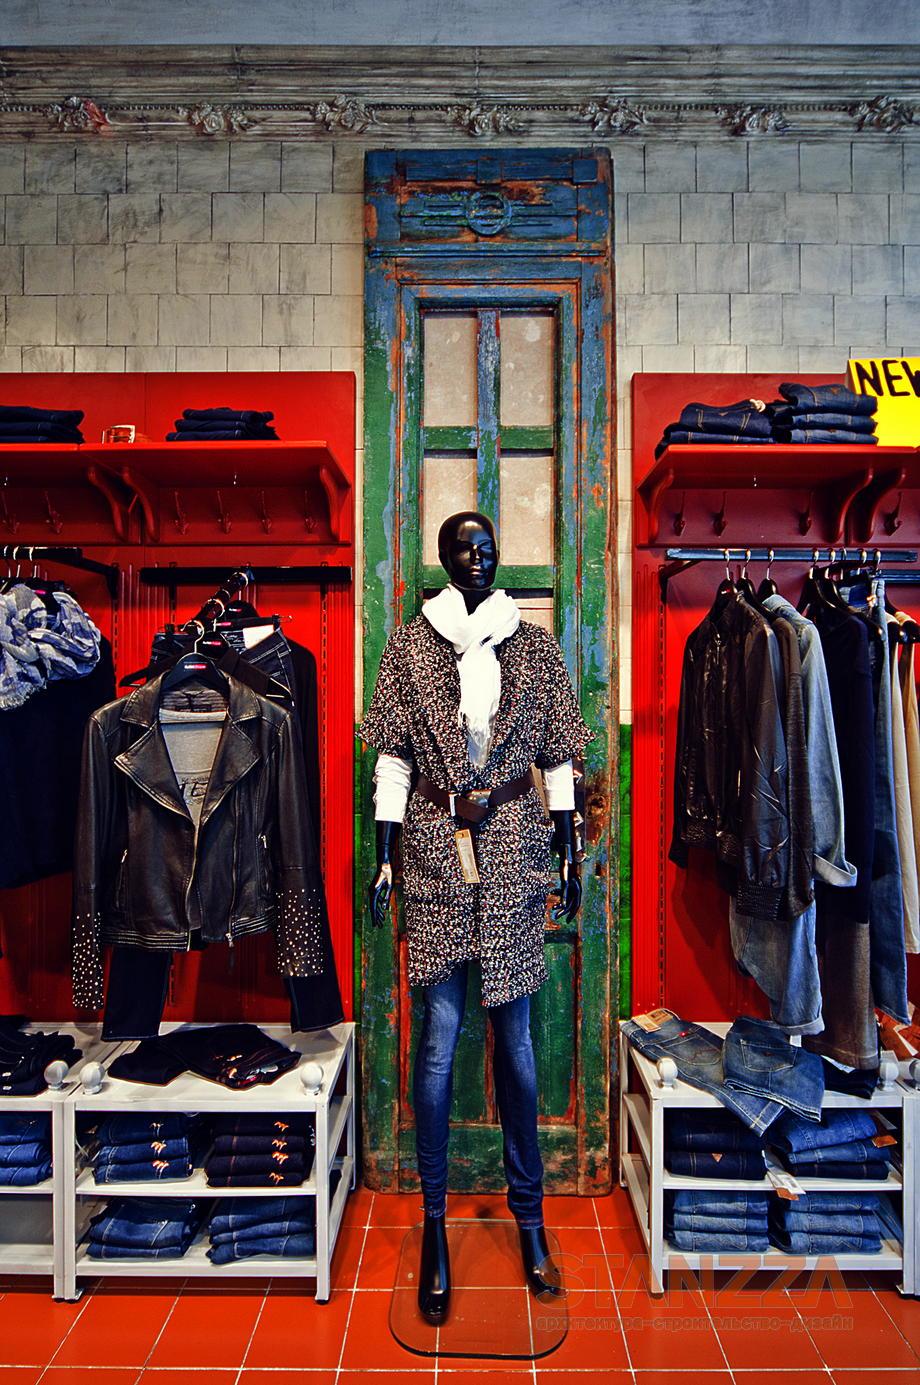 Kulttovary Fashion Store Stanzza